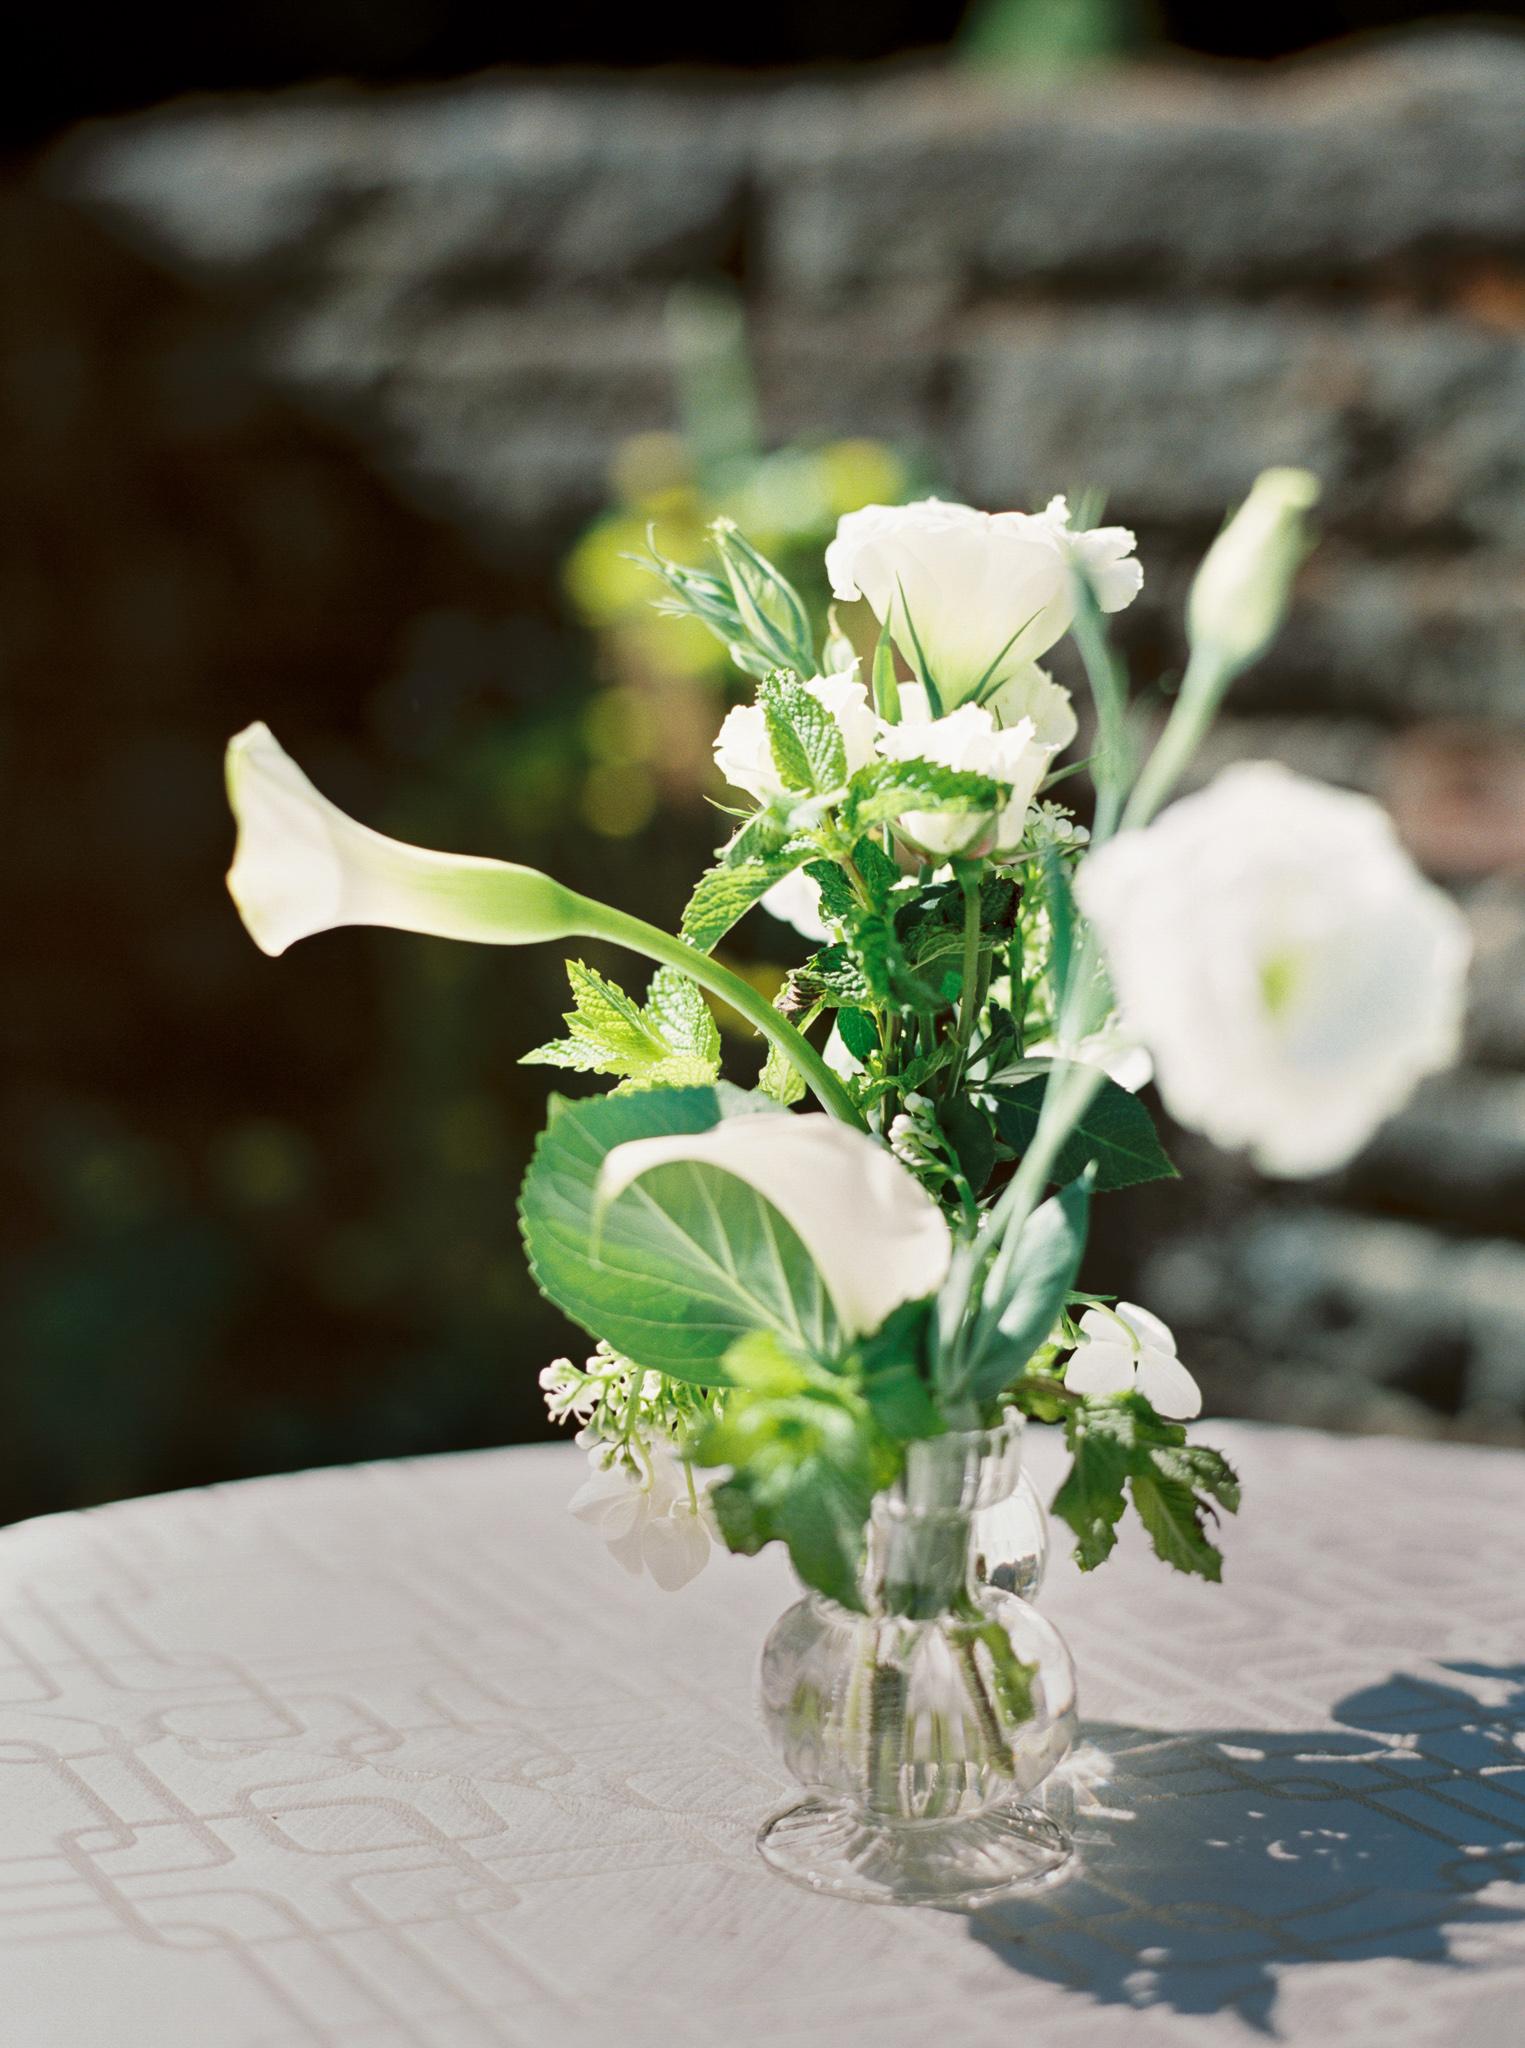 157OutliveCreative_Travel_Photographer_Videographer_Lewis&Clark_Oregon_Elegant_BlackTie_Destination_Wedding.jpg